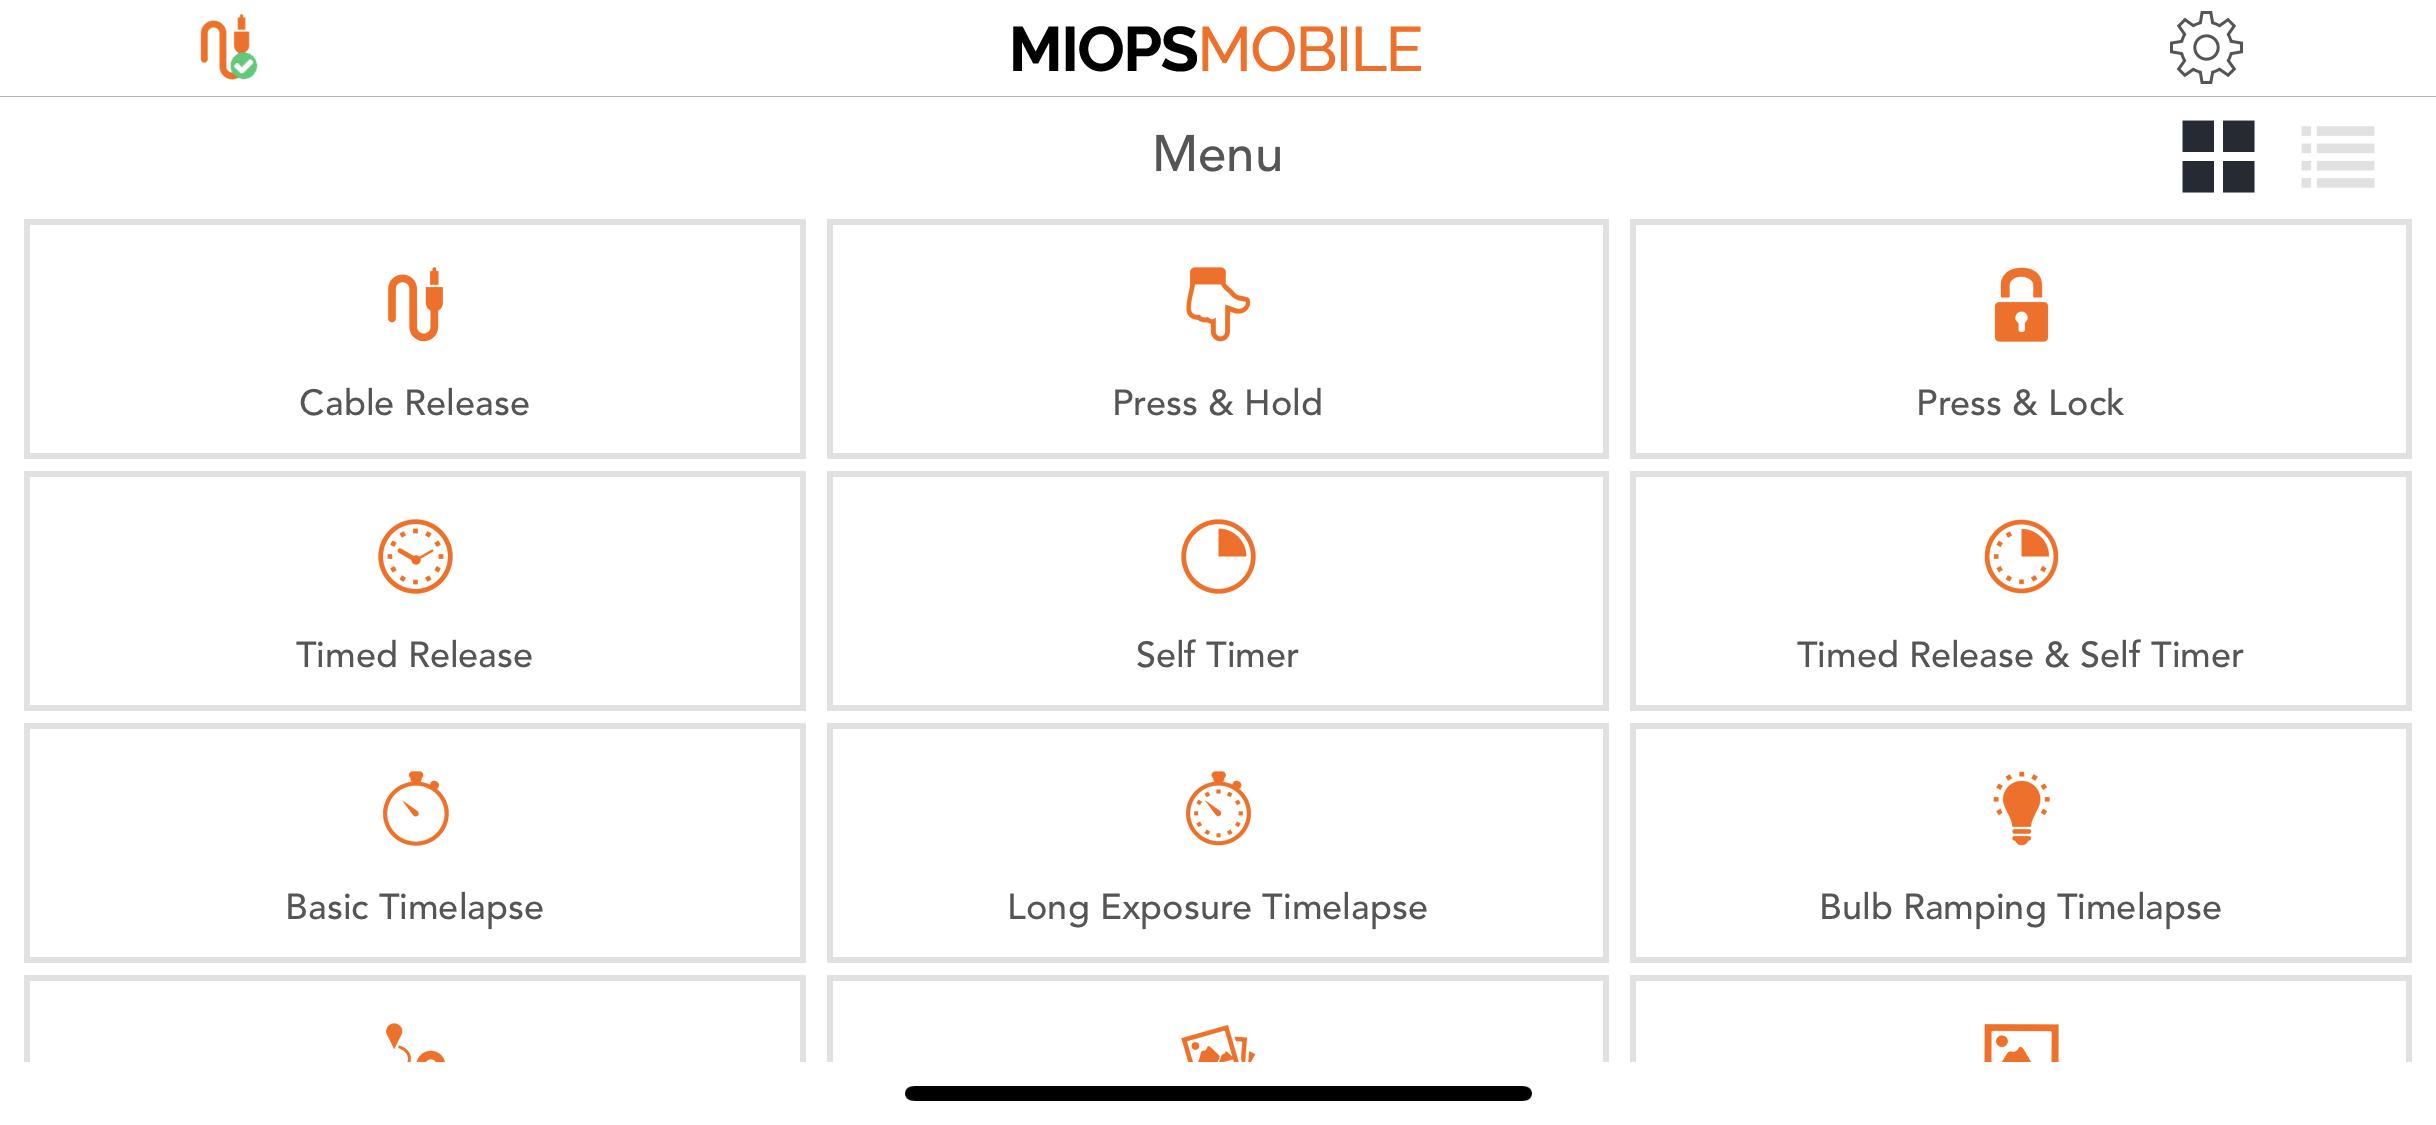 App-based camera triggers: Alpine Labs Spark vs Miops Mobile